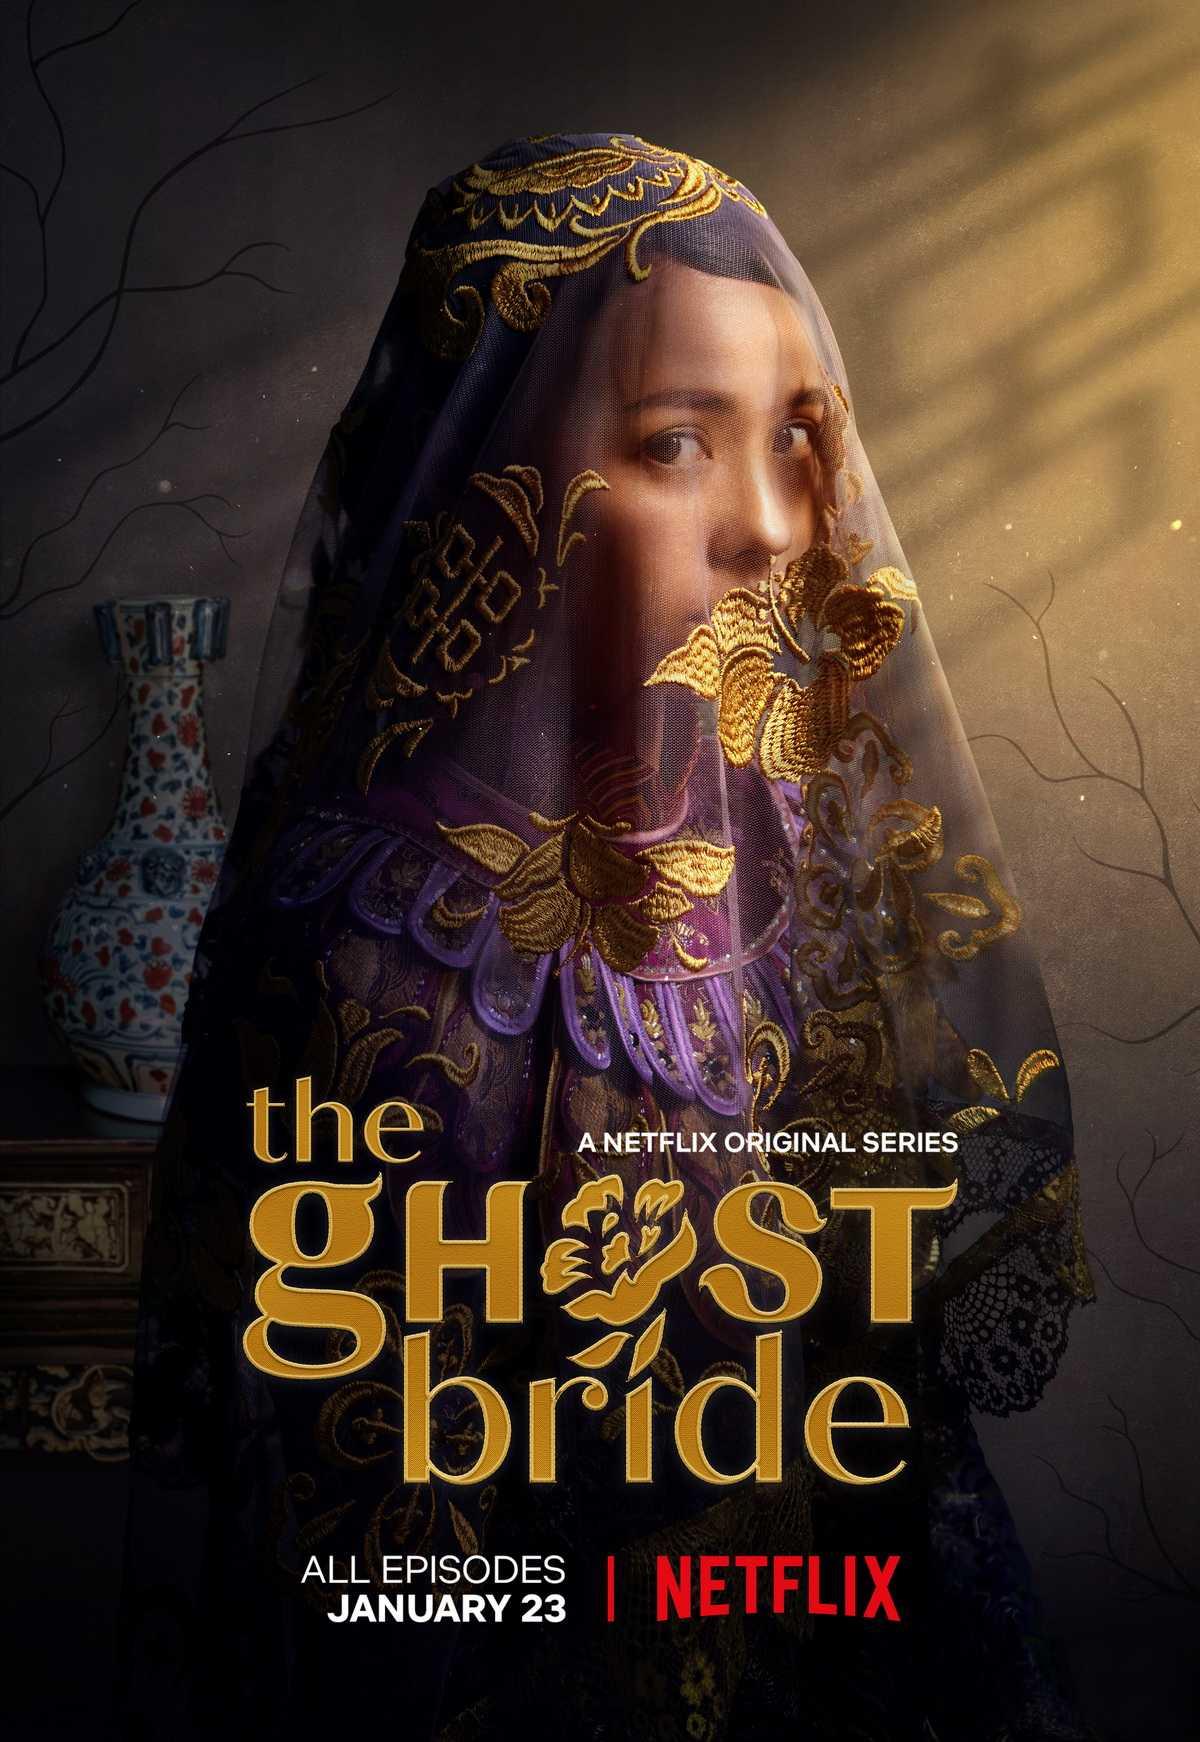 the-ghost-bride-เจ้าสาวเซ่นศพ-พากย์ไทย-ตอนที่-1-6-จบ-